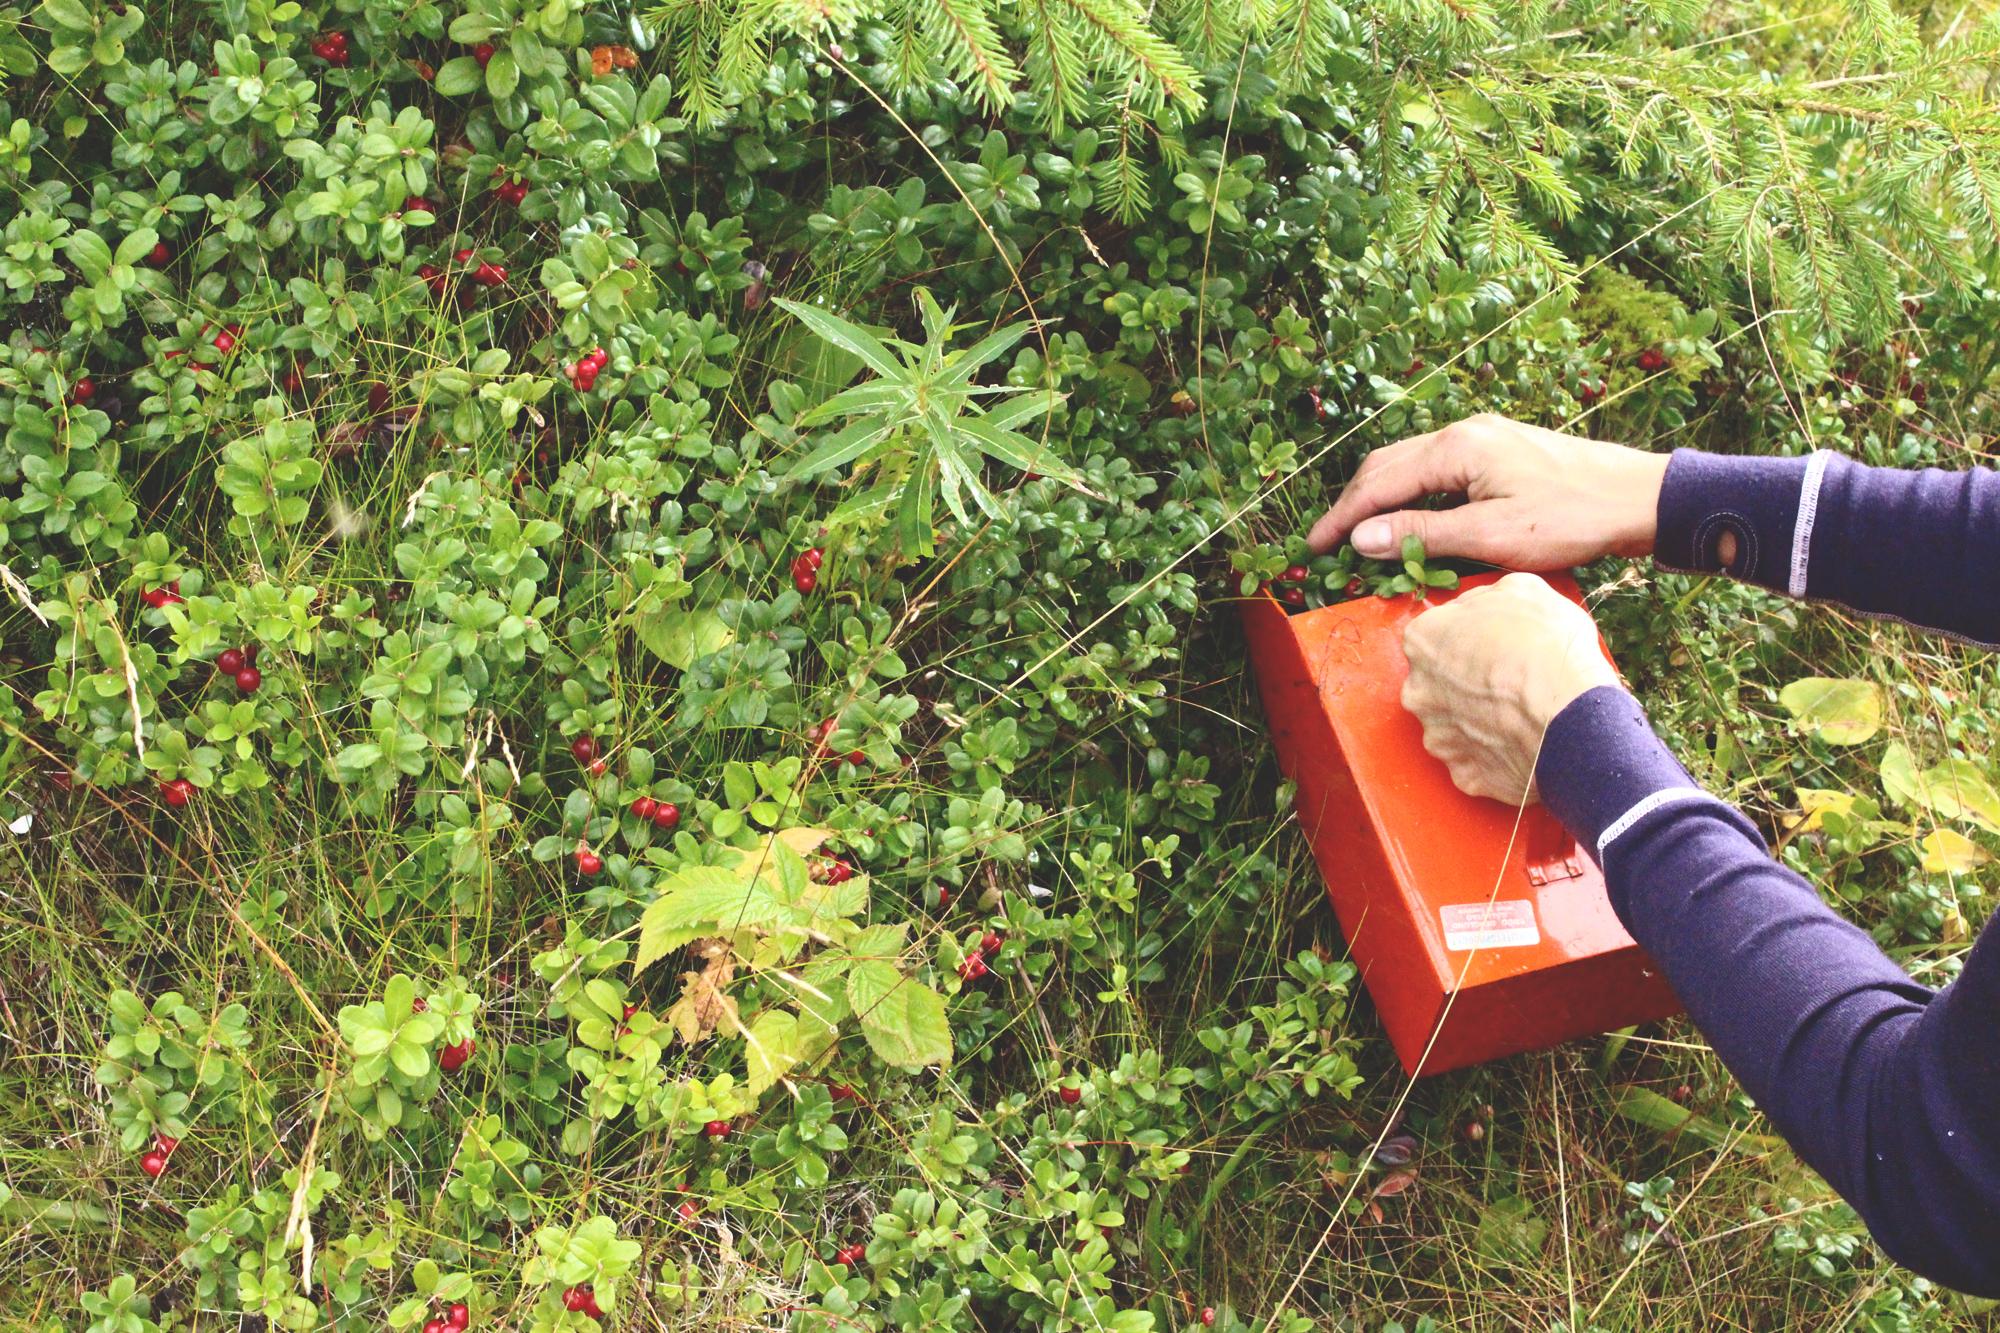 Malin  gathering lingonberries